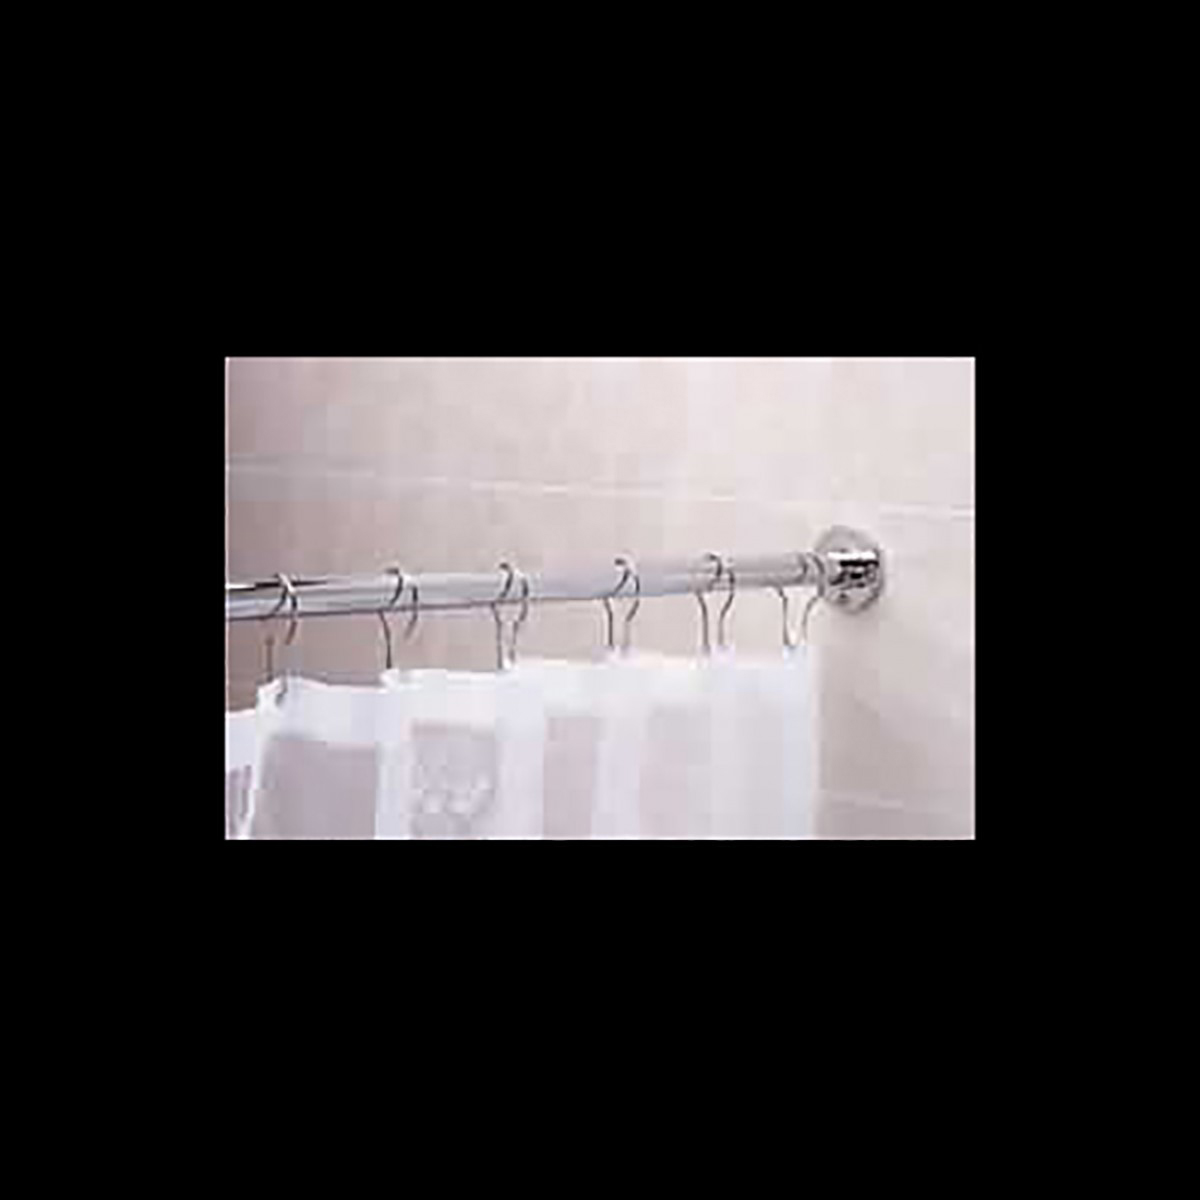 Shower Curtain Rod Bright Chrome 5 Long Shower Rod Shower Curtain Rod Shower Curtain Rods